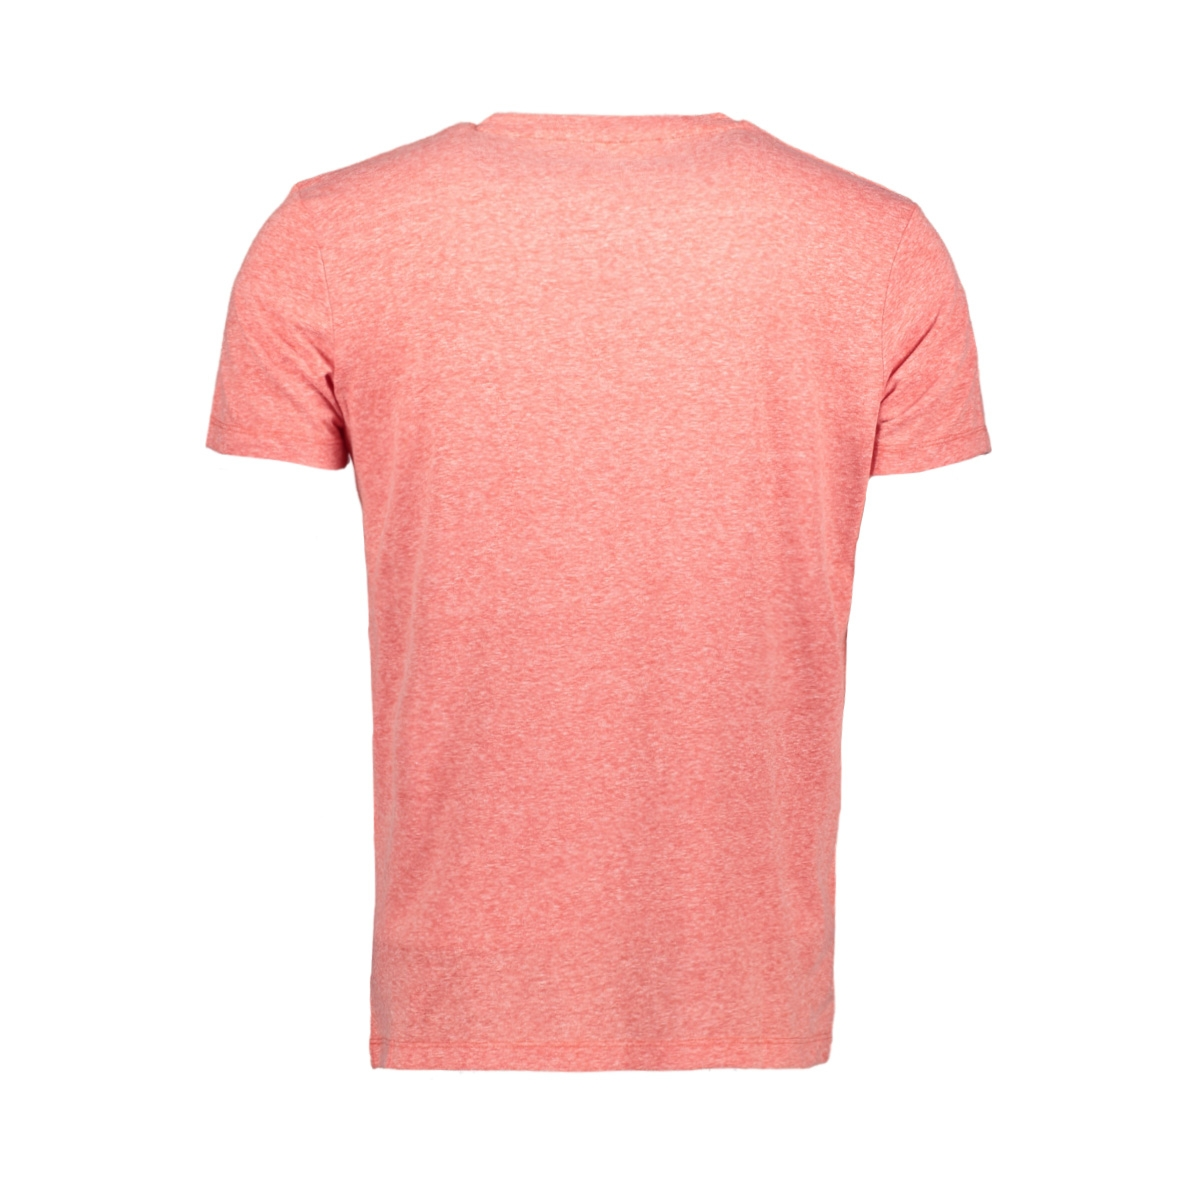 t shirt met print 1010855xx12 tom tailor t-shirt 16067